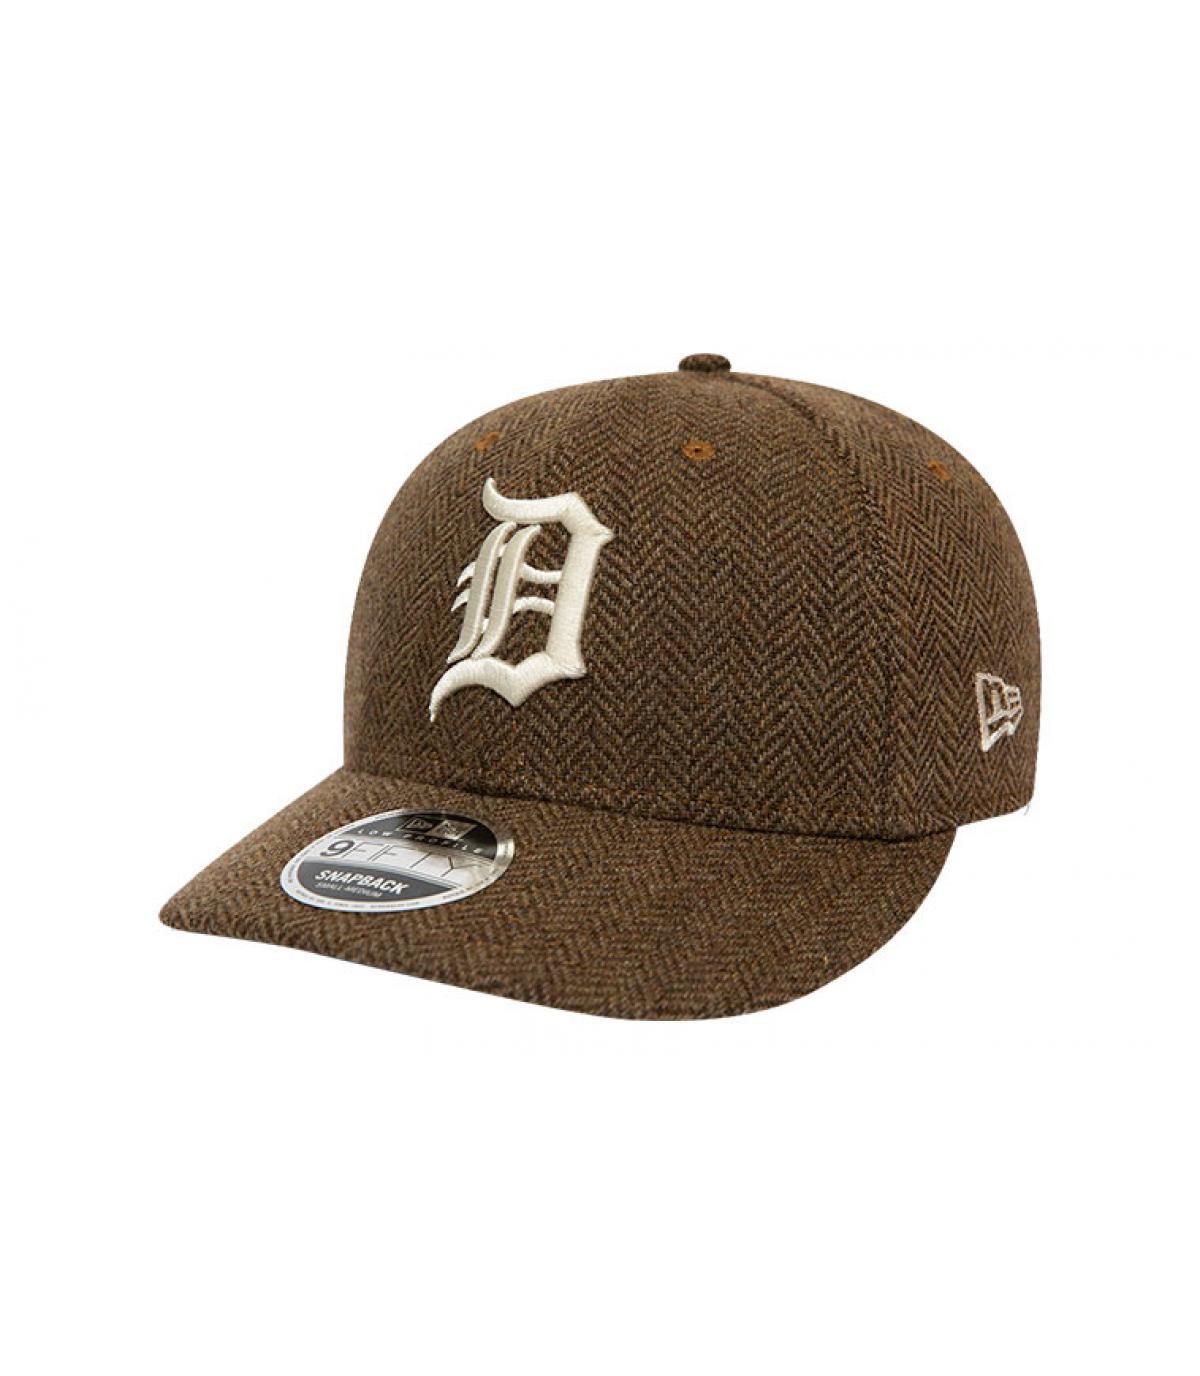 Details Snapback MLB Tweed Detroit 950 old gold - Abbildung 2